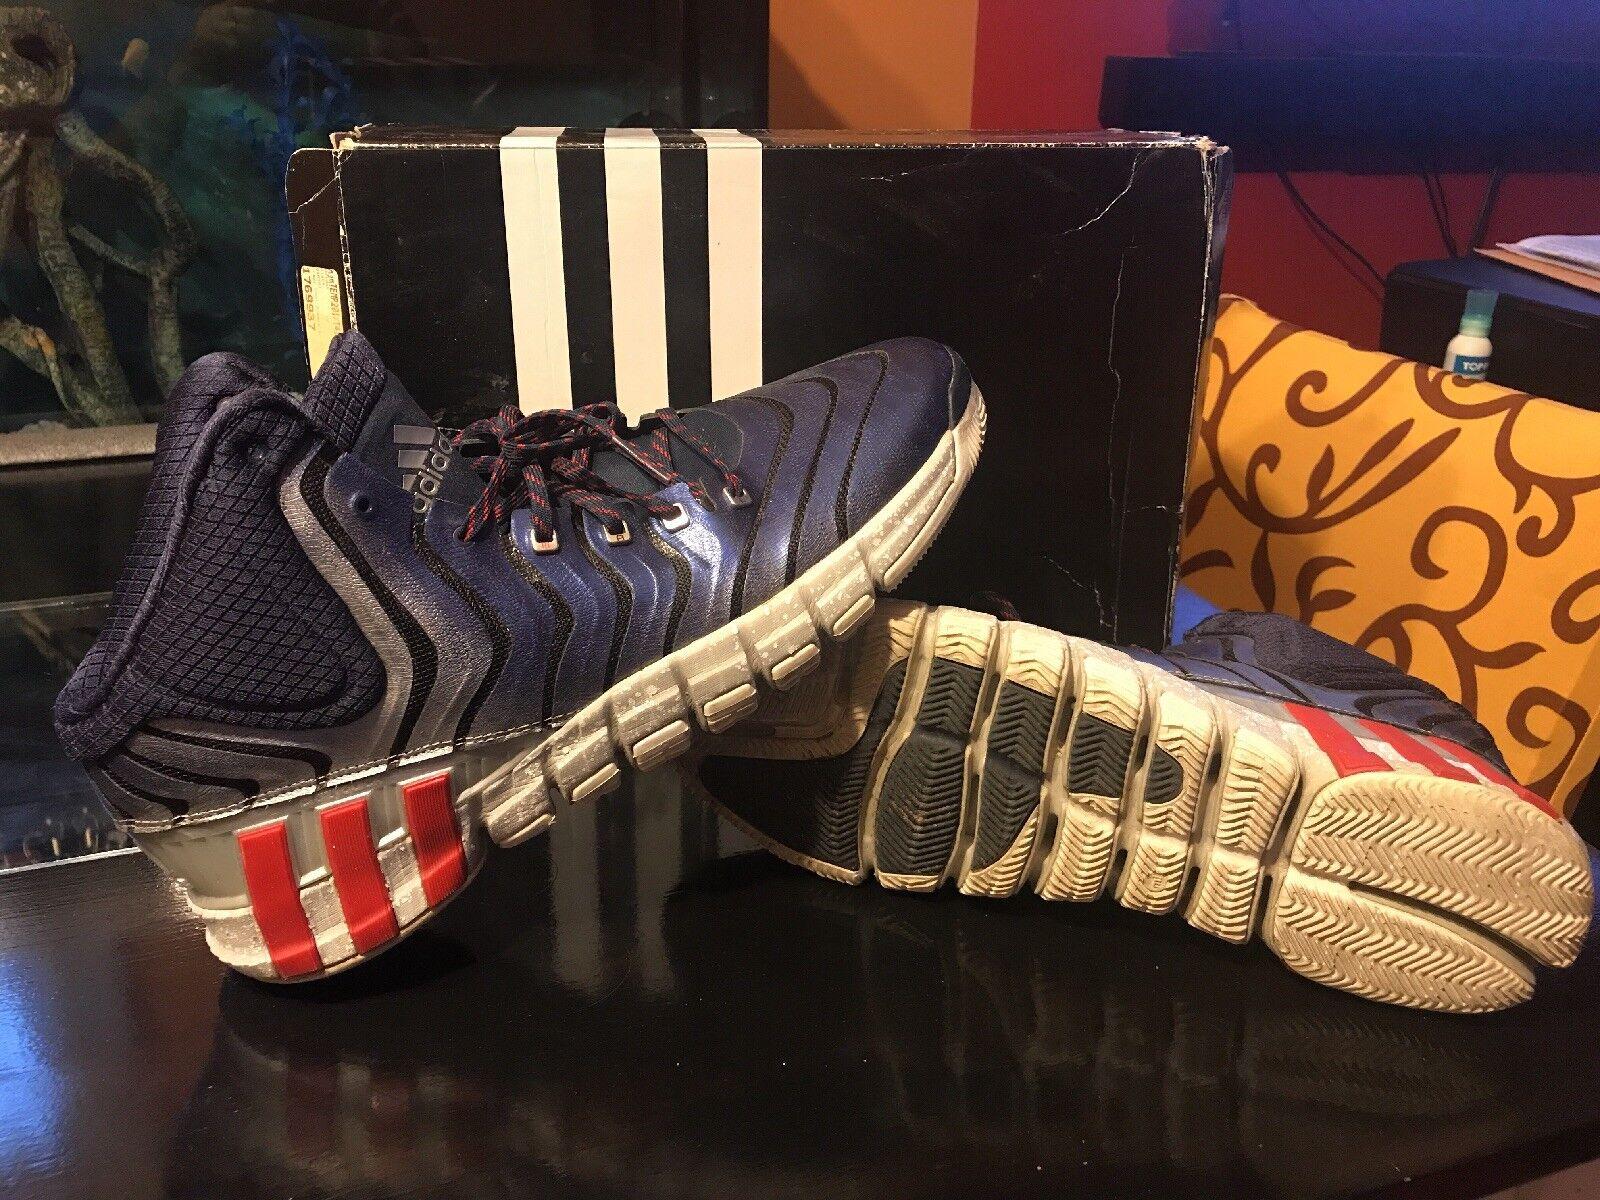 Adidas Crazy Cool Basketball shoes (John Wall)